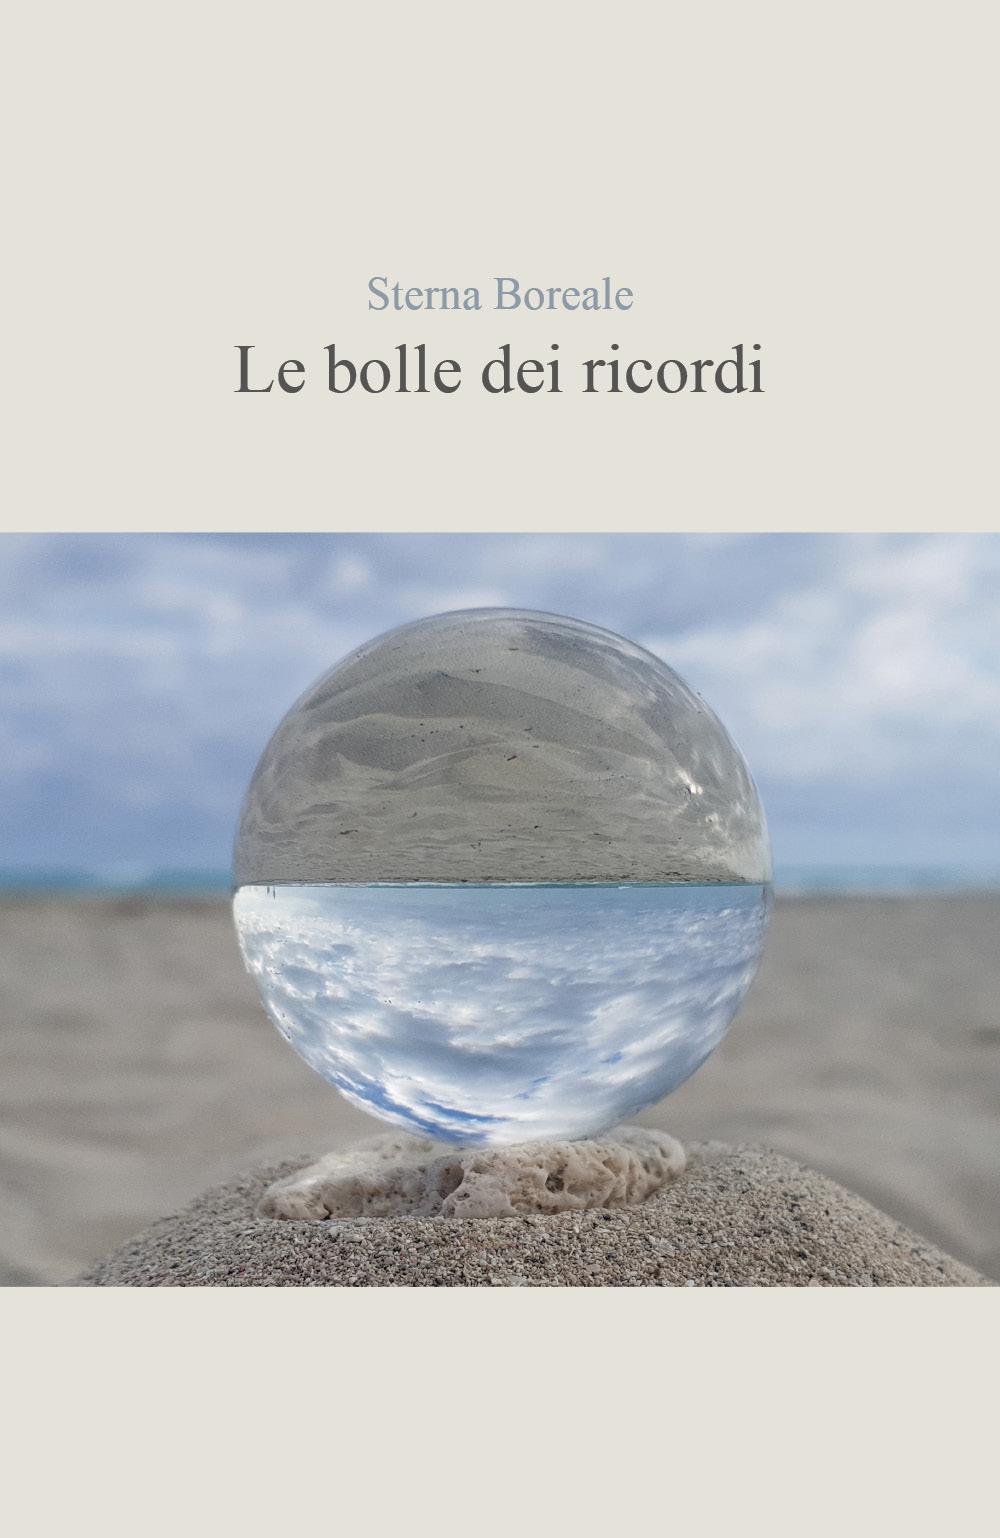 Le bolle dei ricordi